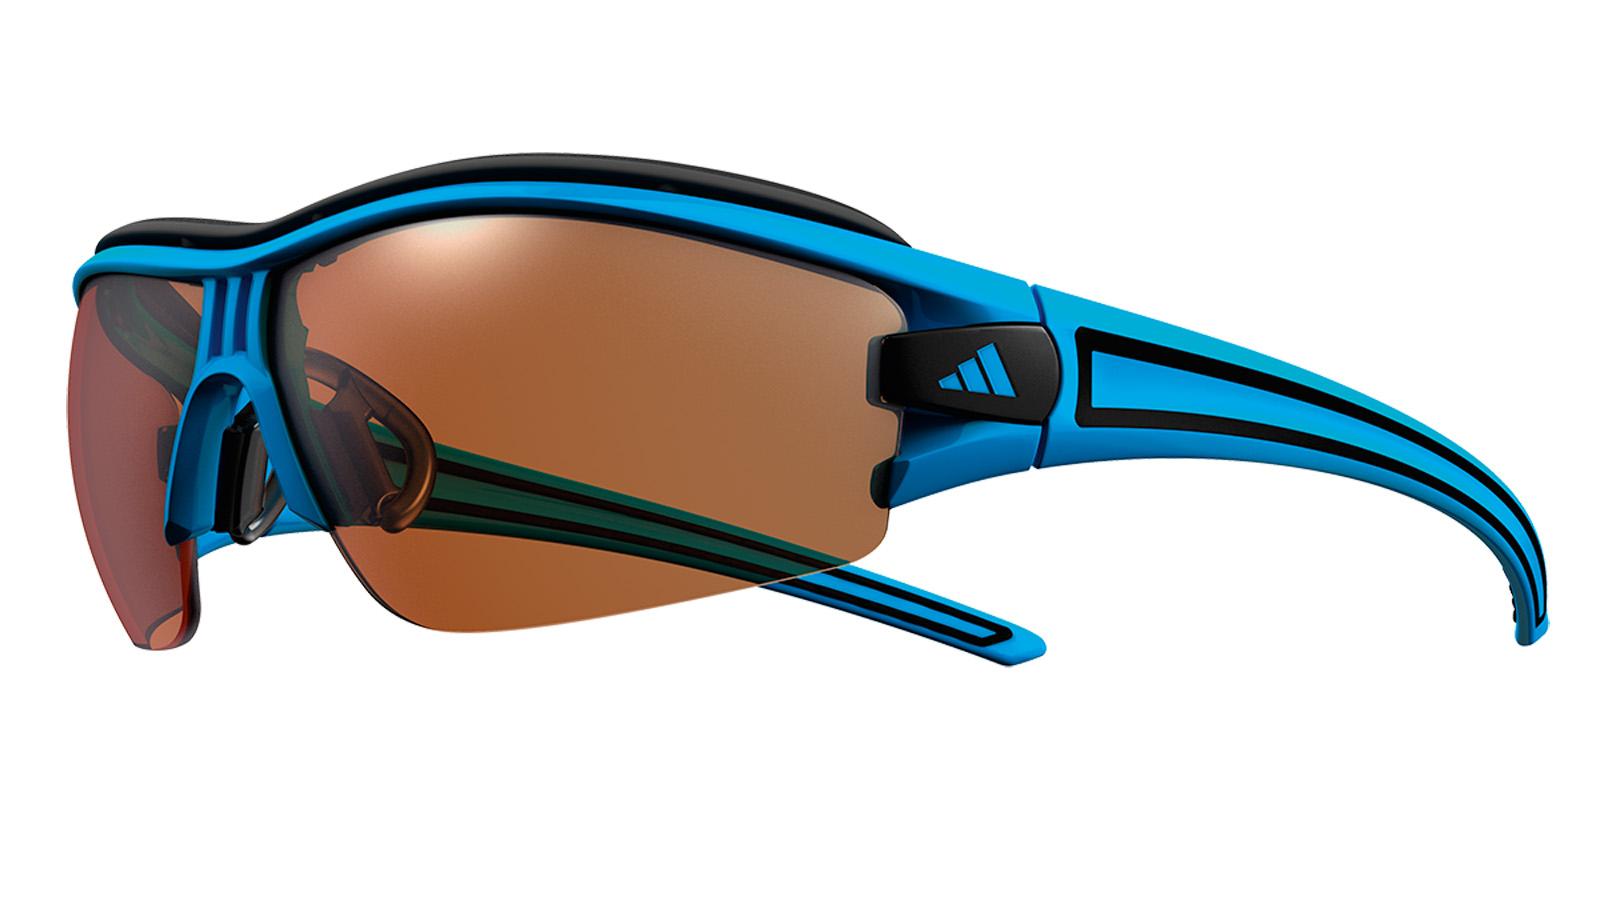 adidas eyewear australia on sale > OFF59% Discounts